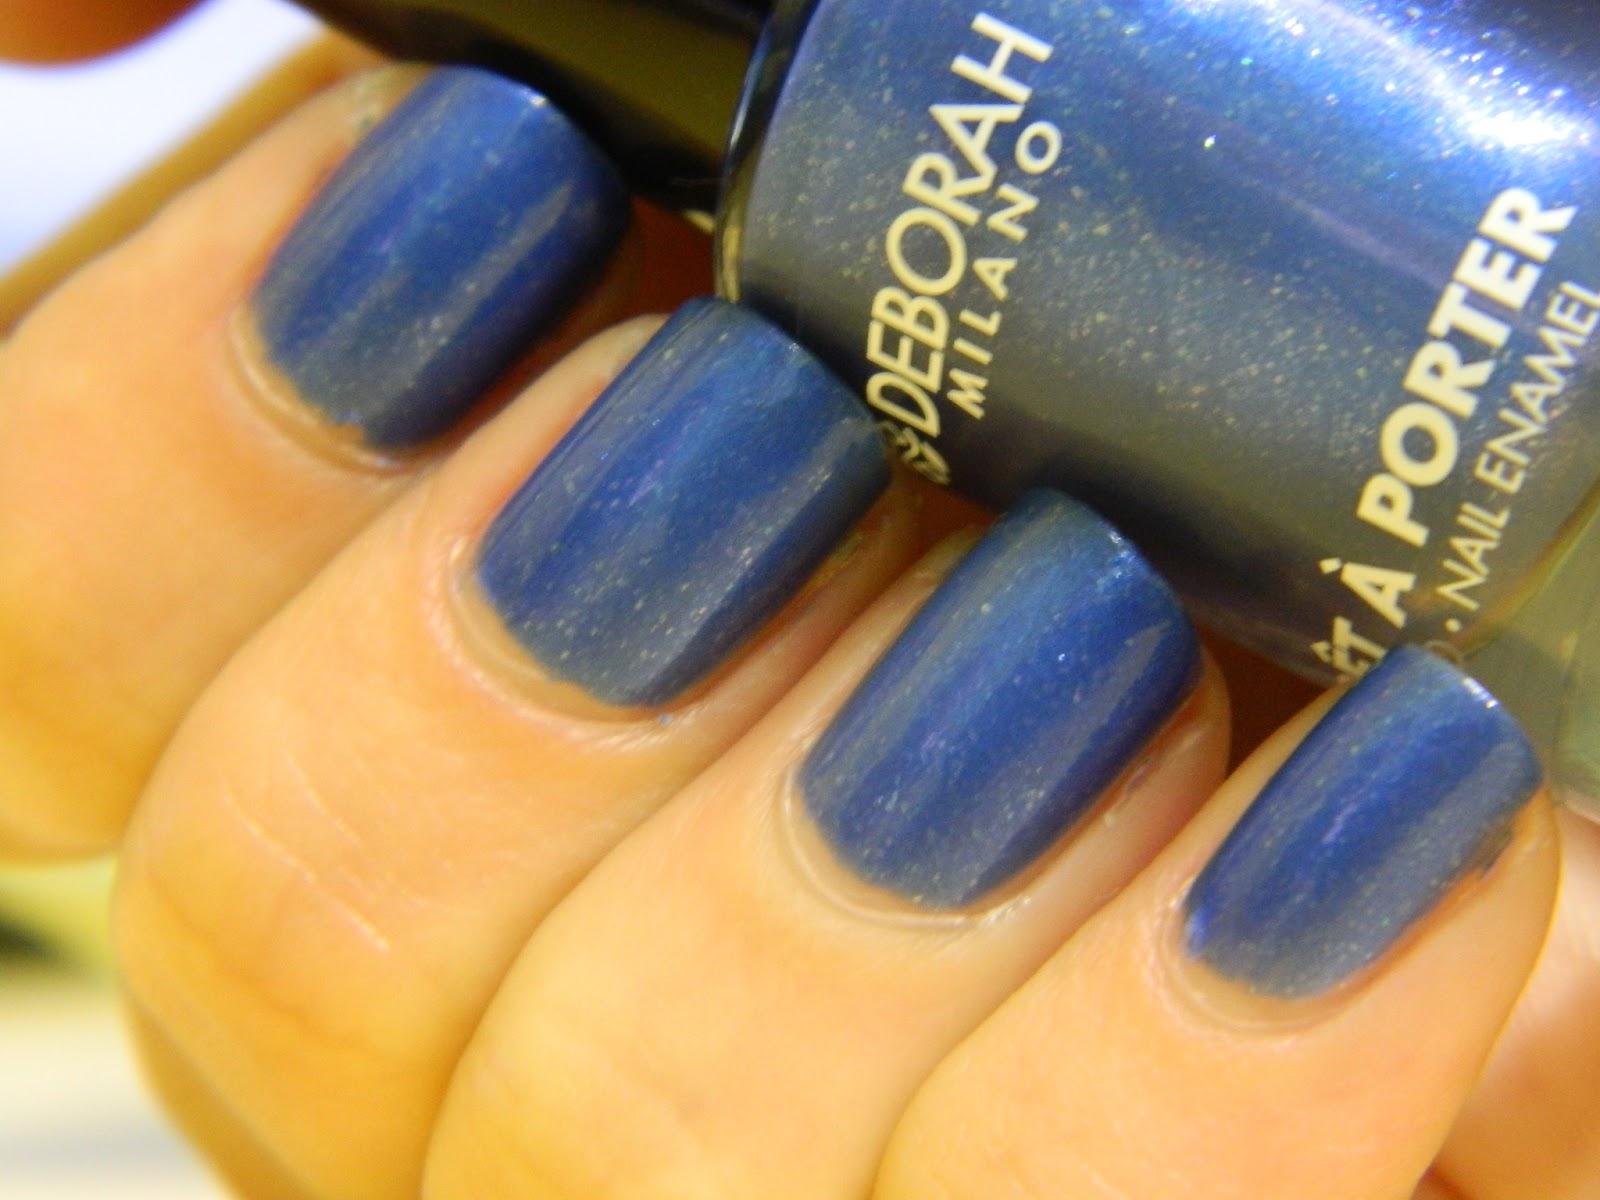 Mostly nail polish: Deborah Milano - Celestial Sky